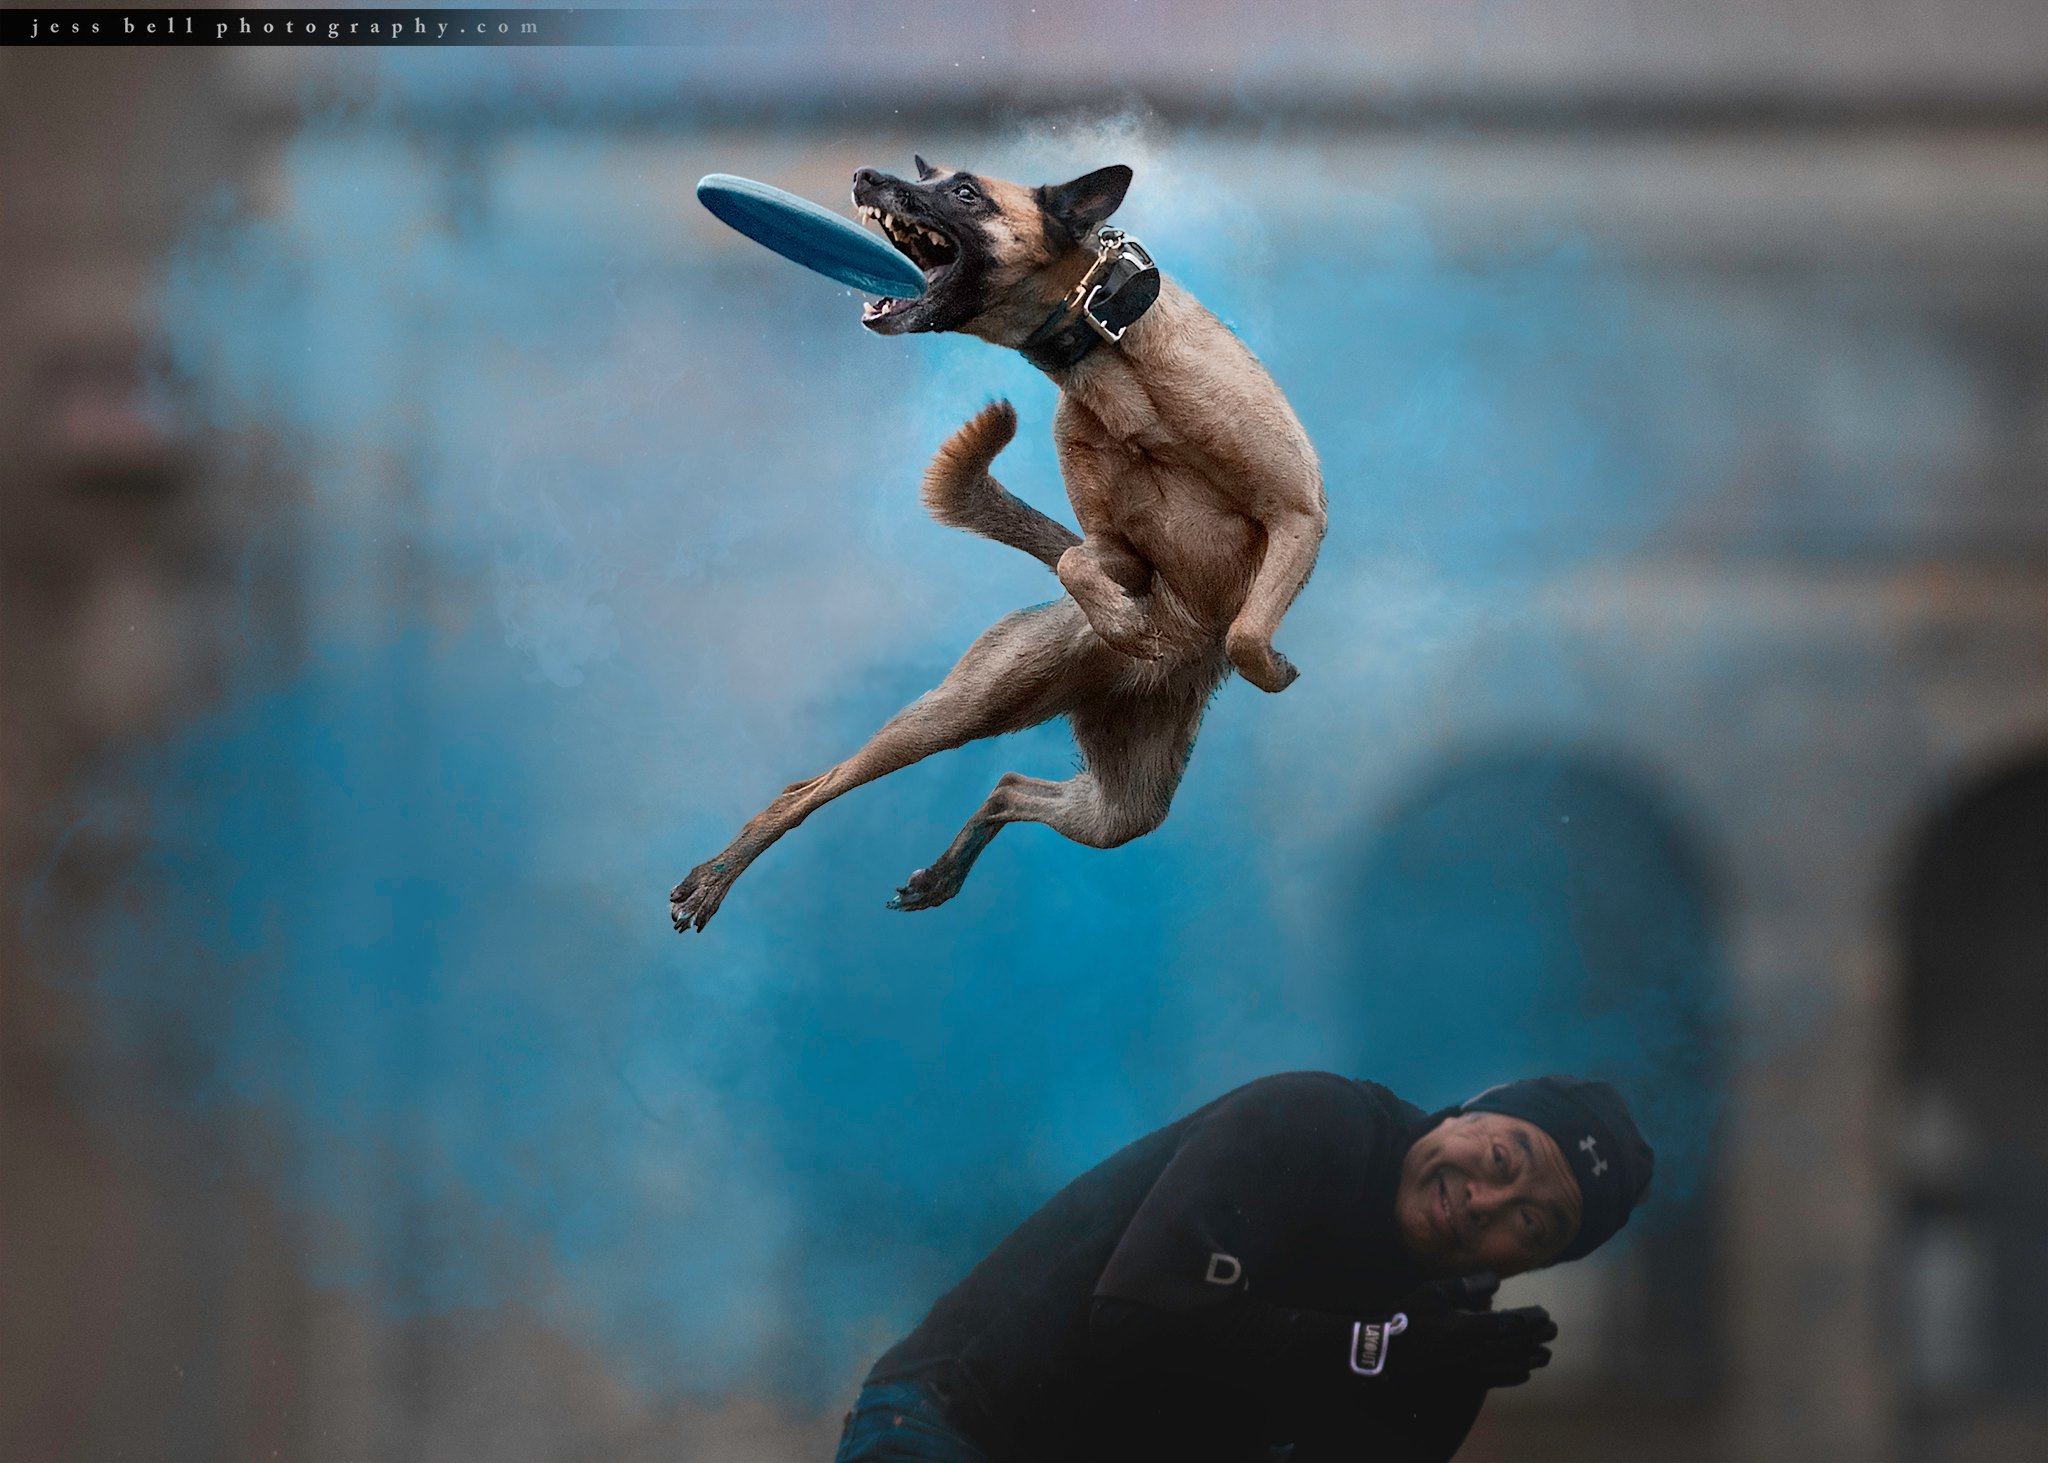 Jess Bell Photography - holi sessions - Toronto Pet Photographer